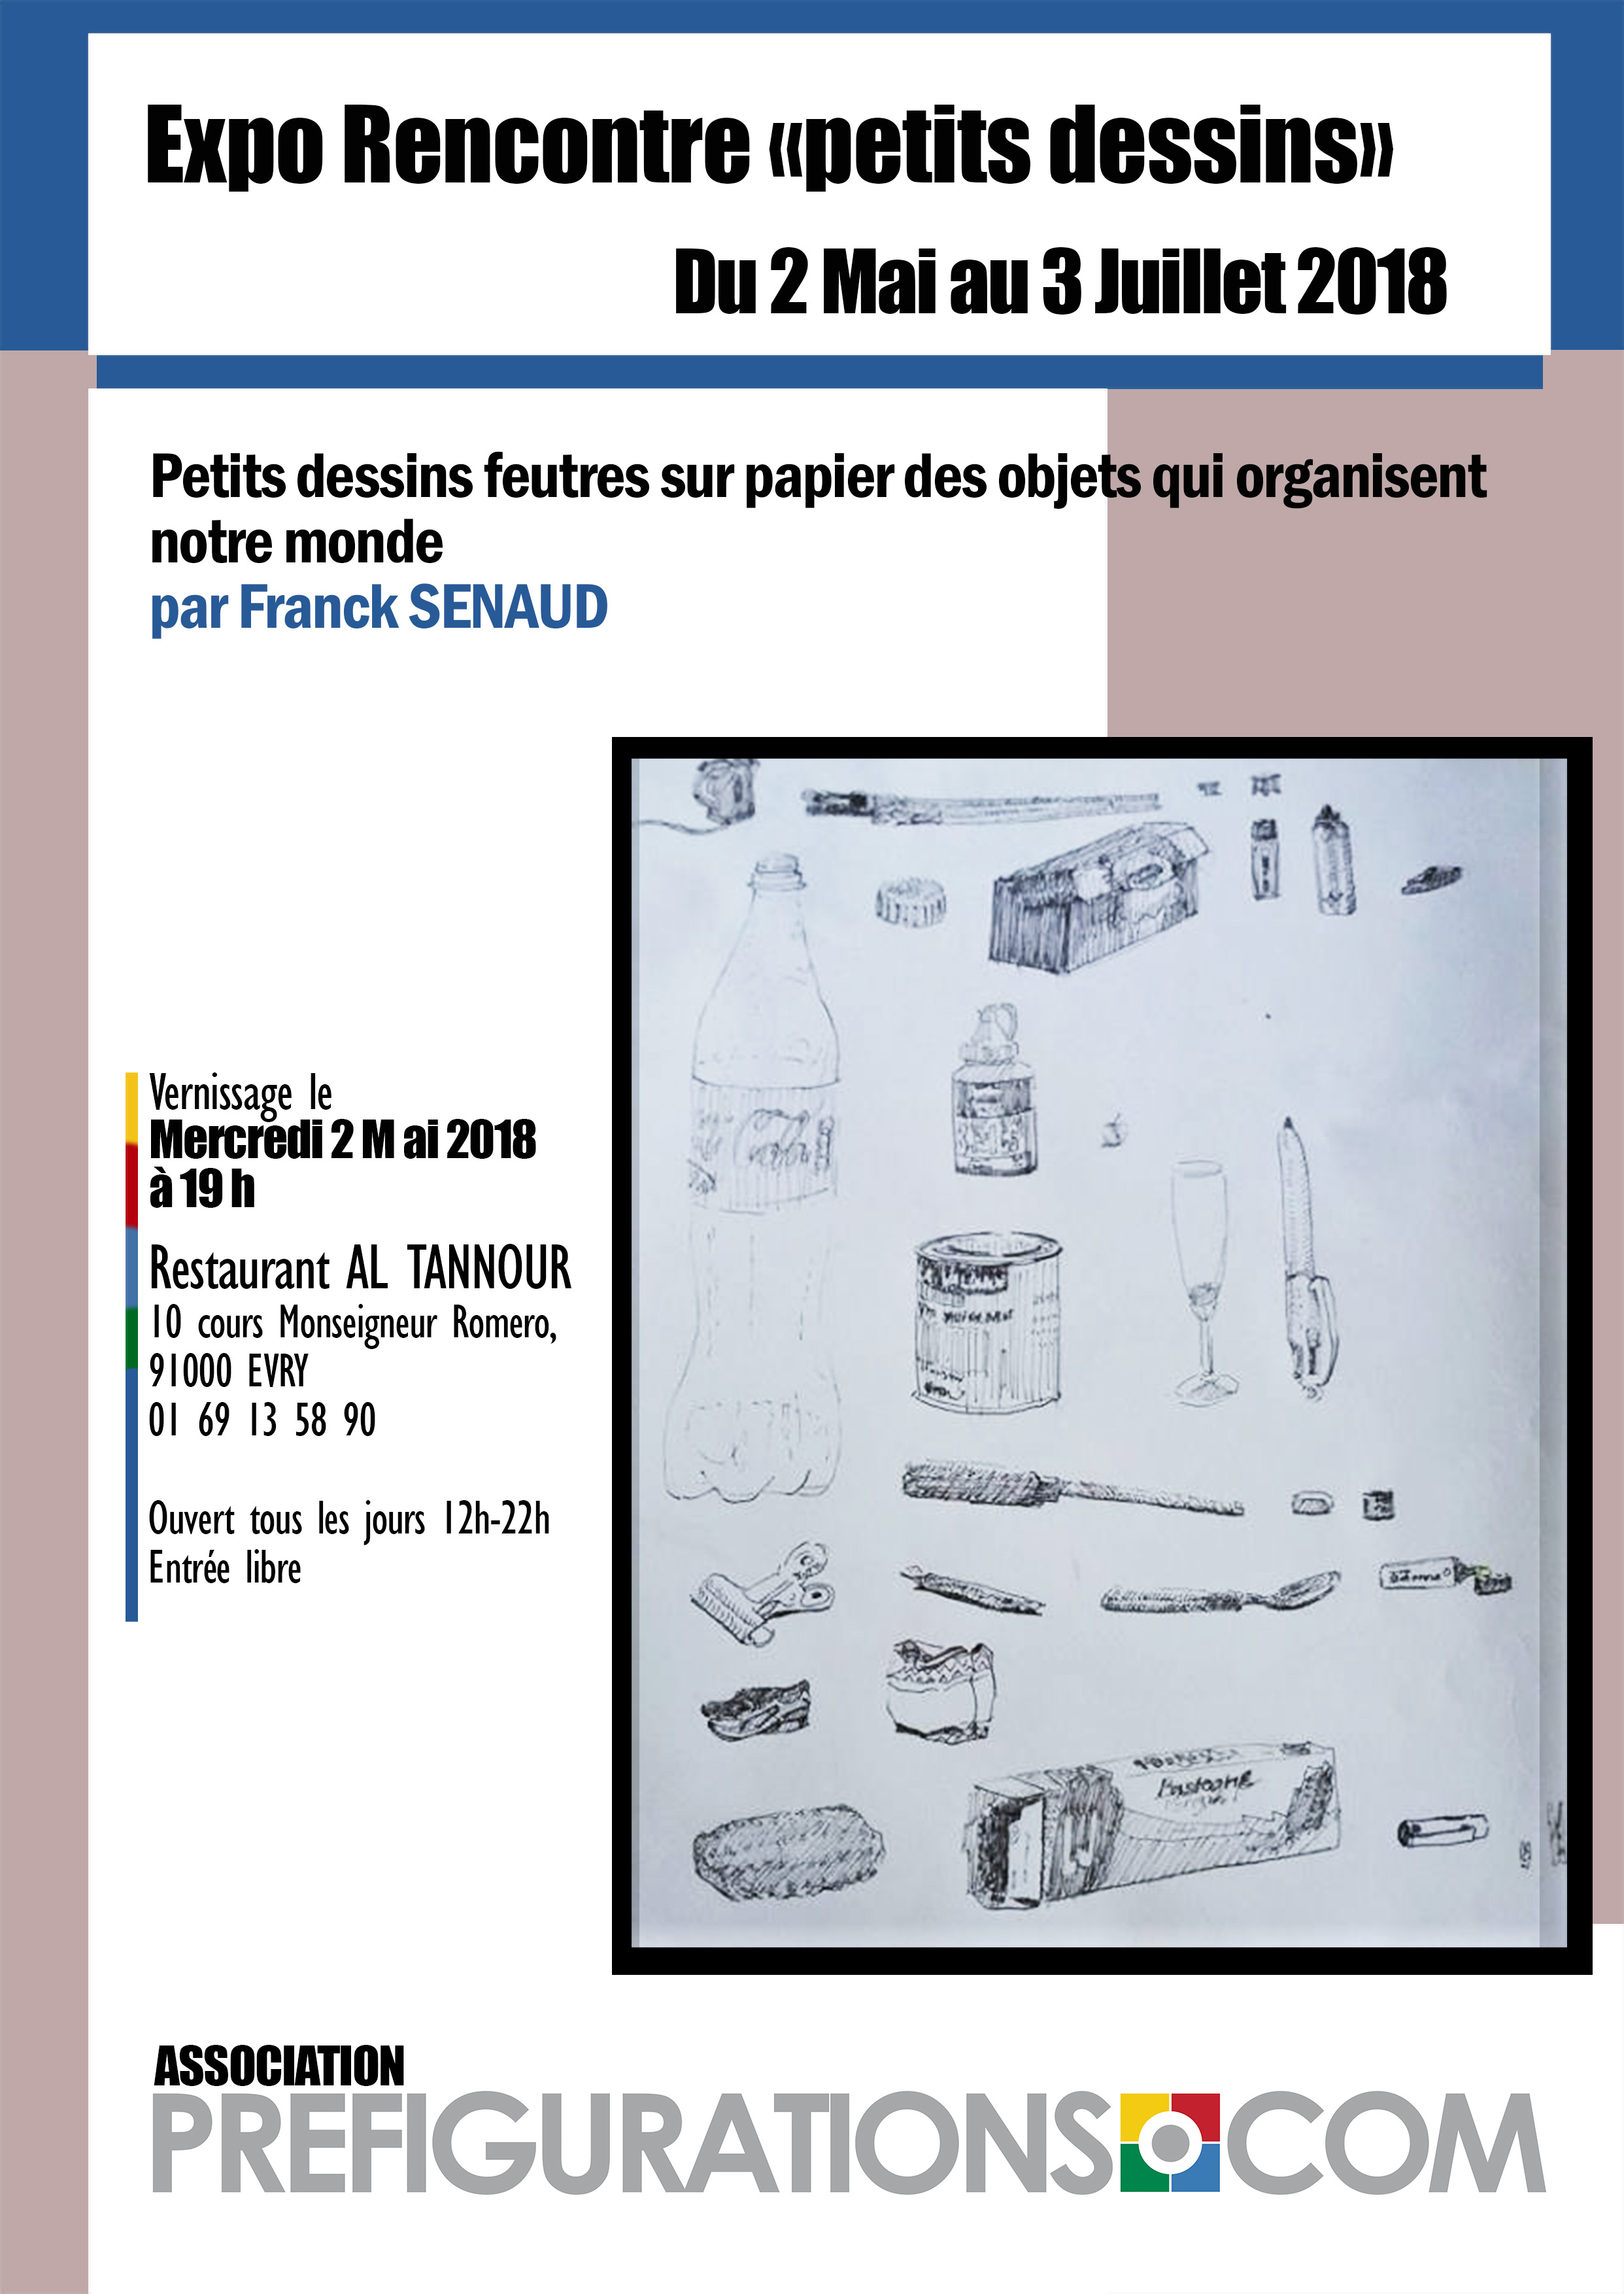 EXPO-RENCONTRE «Petits objets », F. SENAUD @ Al Tannour